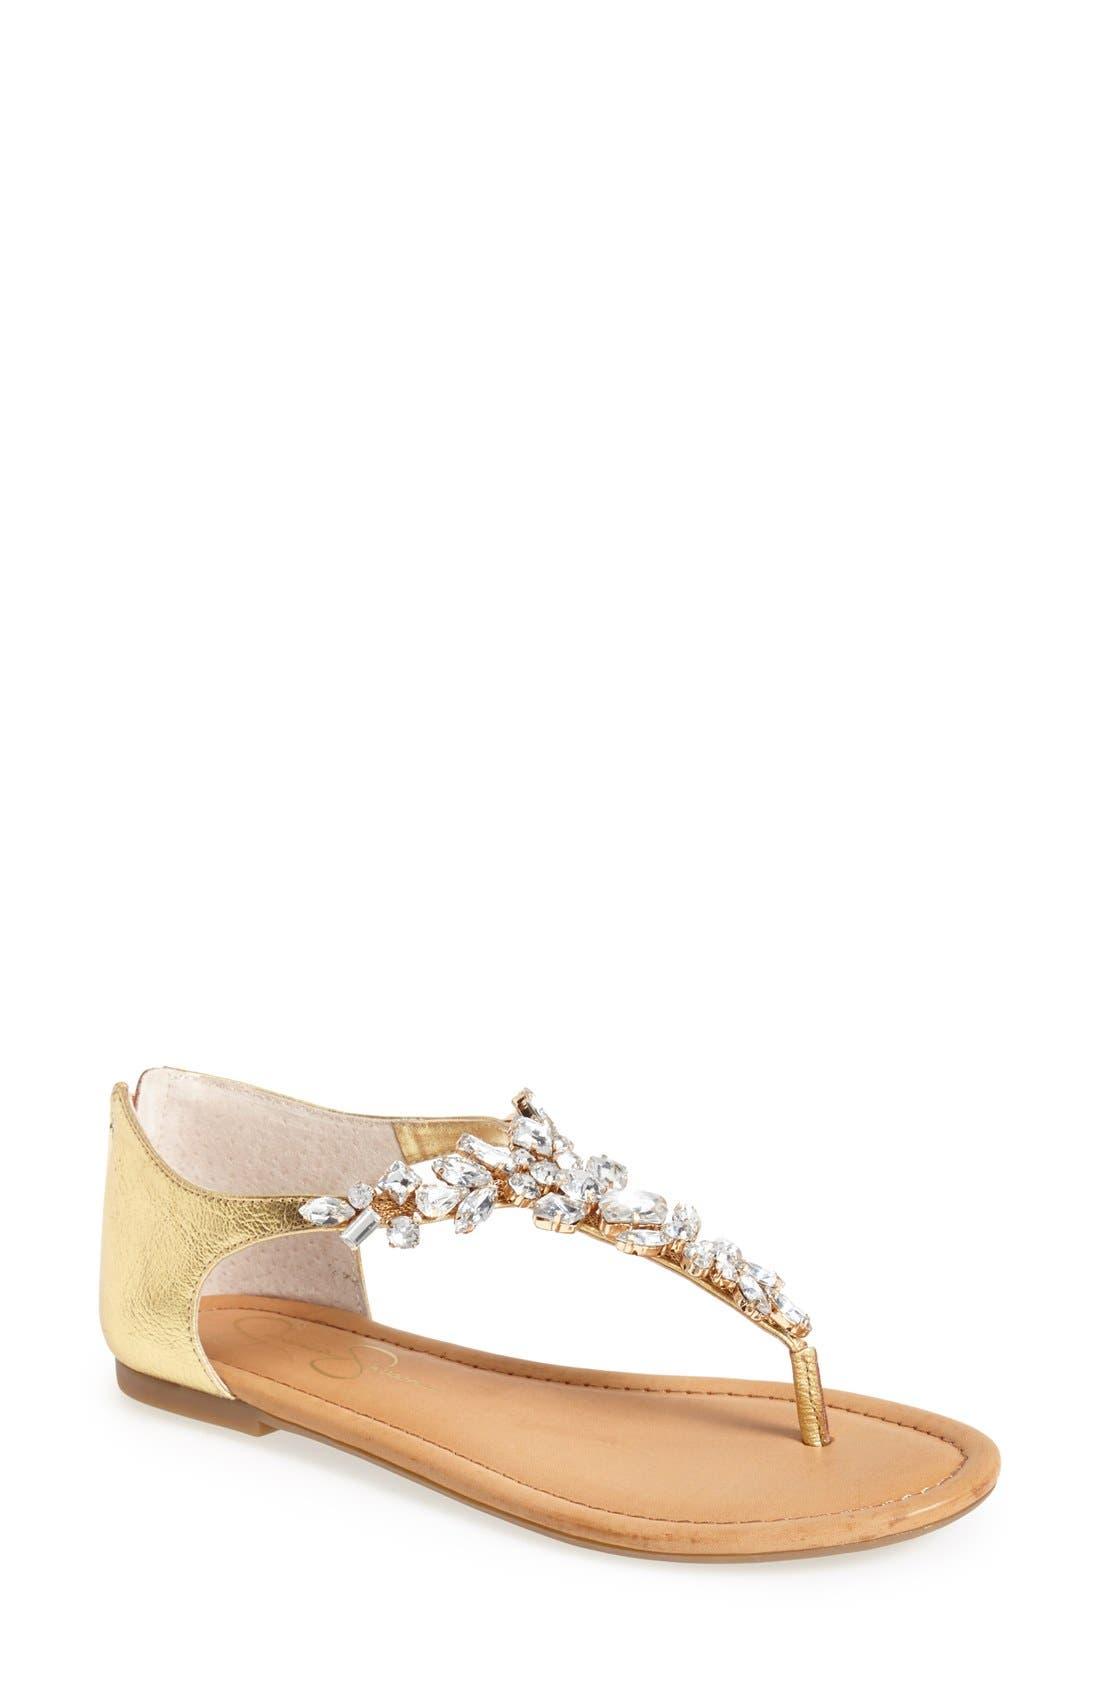 Alternate Image 1 Selected - Jessica Simpson 'Radient' Crystal Embellished Sandal (Women)